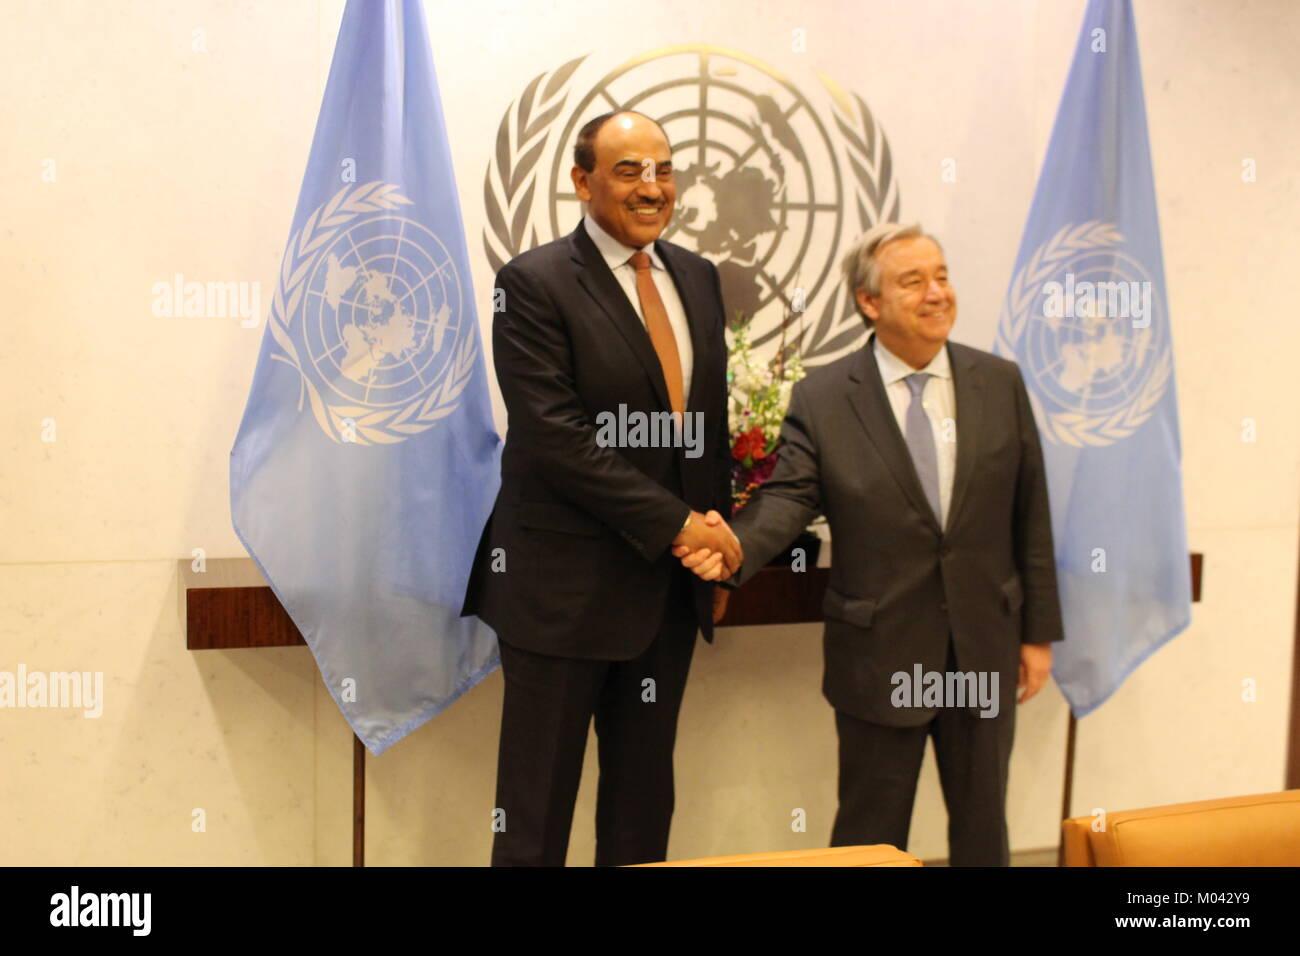 UN, New York, USA. 18th Jan, 2018. UN Sec-Gen Antonio Guterres met Sheikh Sabah Khaled Al Hamad Al Sabah, ForeignStock Photo